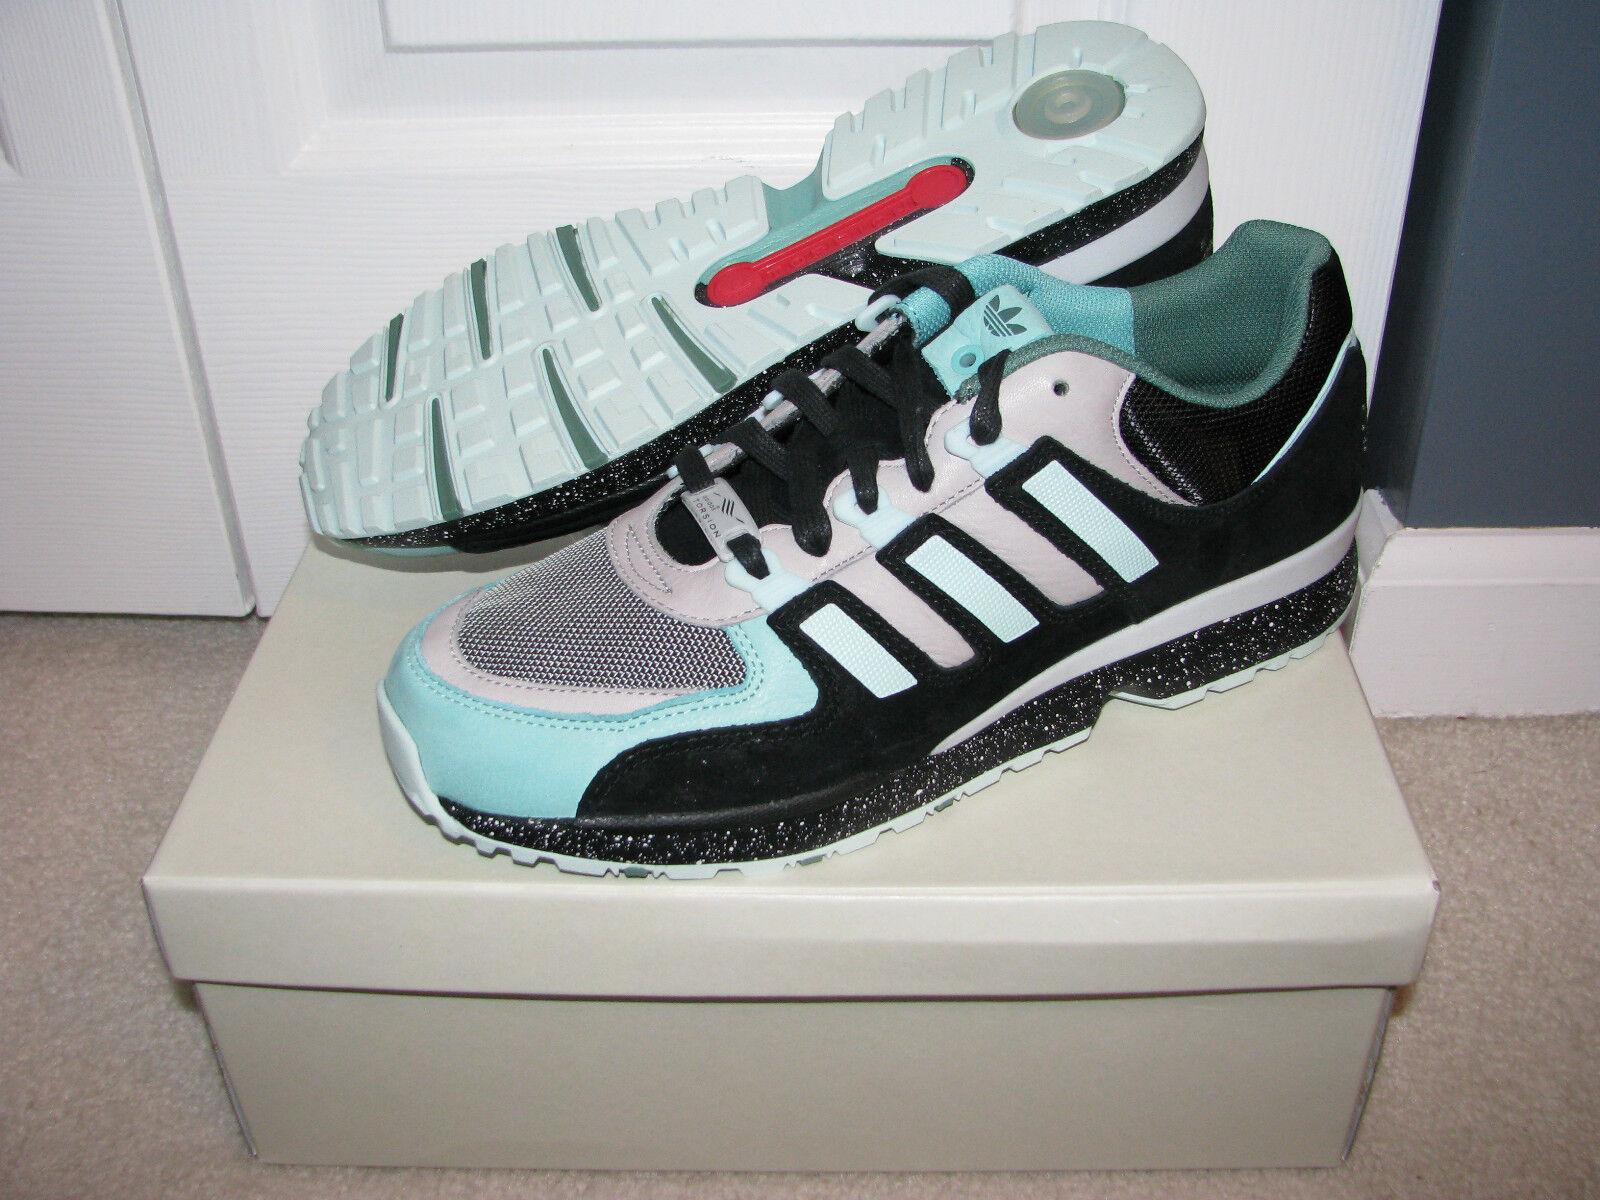 Adidas x SneakerFreaker Consortium Torsion  Integral S Mint Mens Size 9.5 DS NIB   classic style